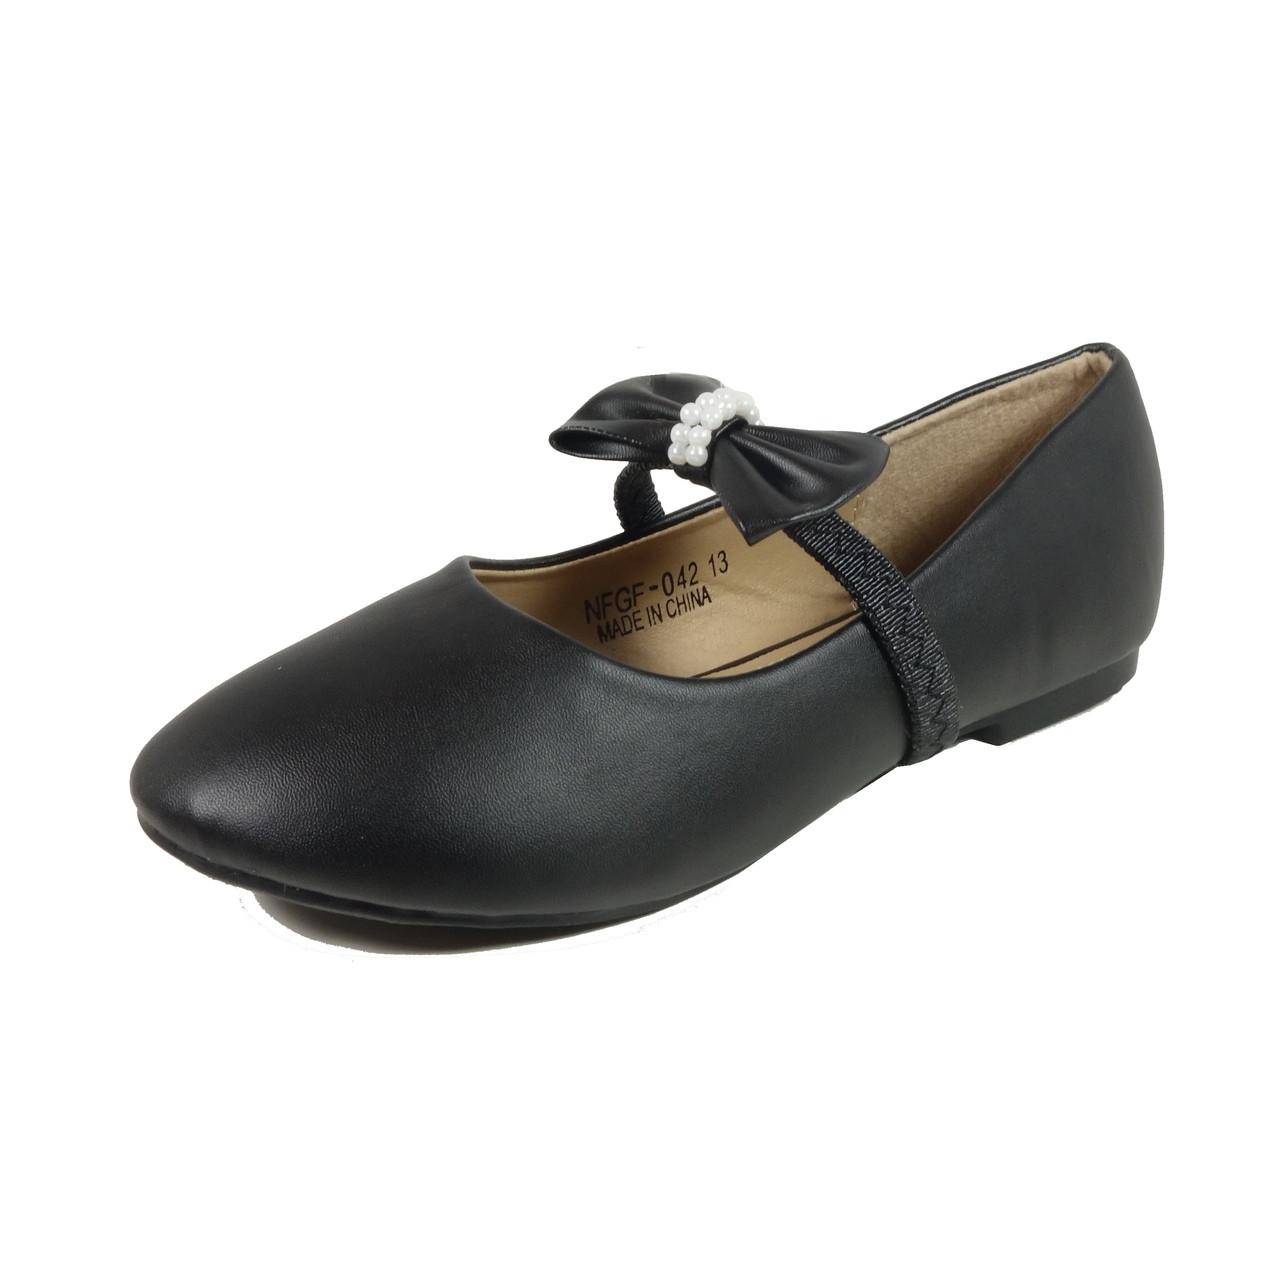 Nova Utopia Toddler Little Girls Flat Shoes - NFGF042 Black - Nova ...